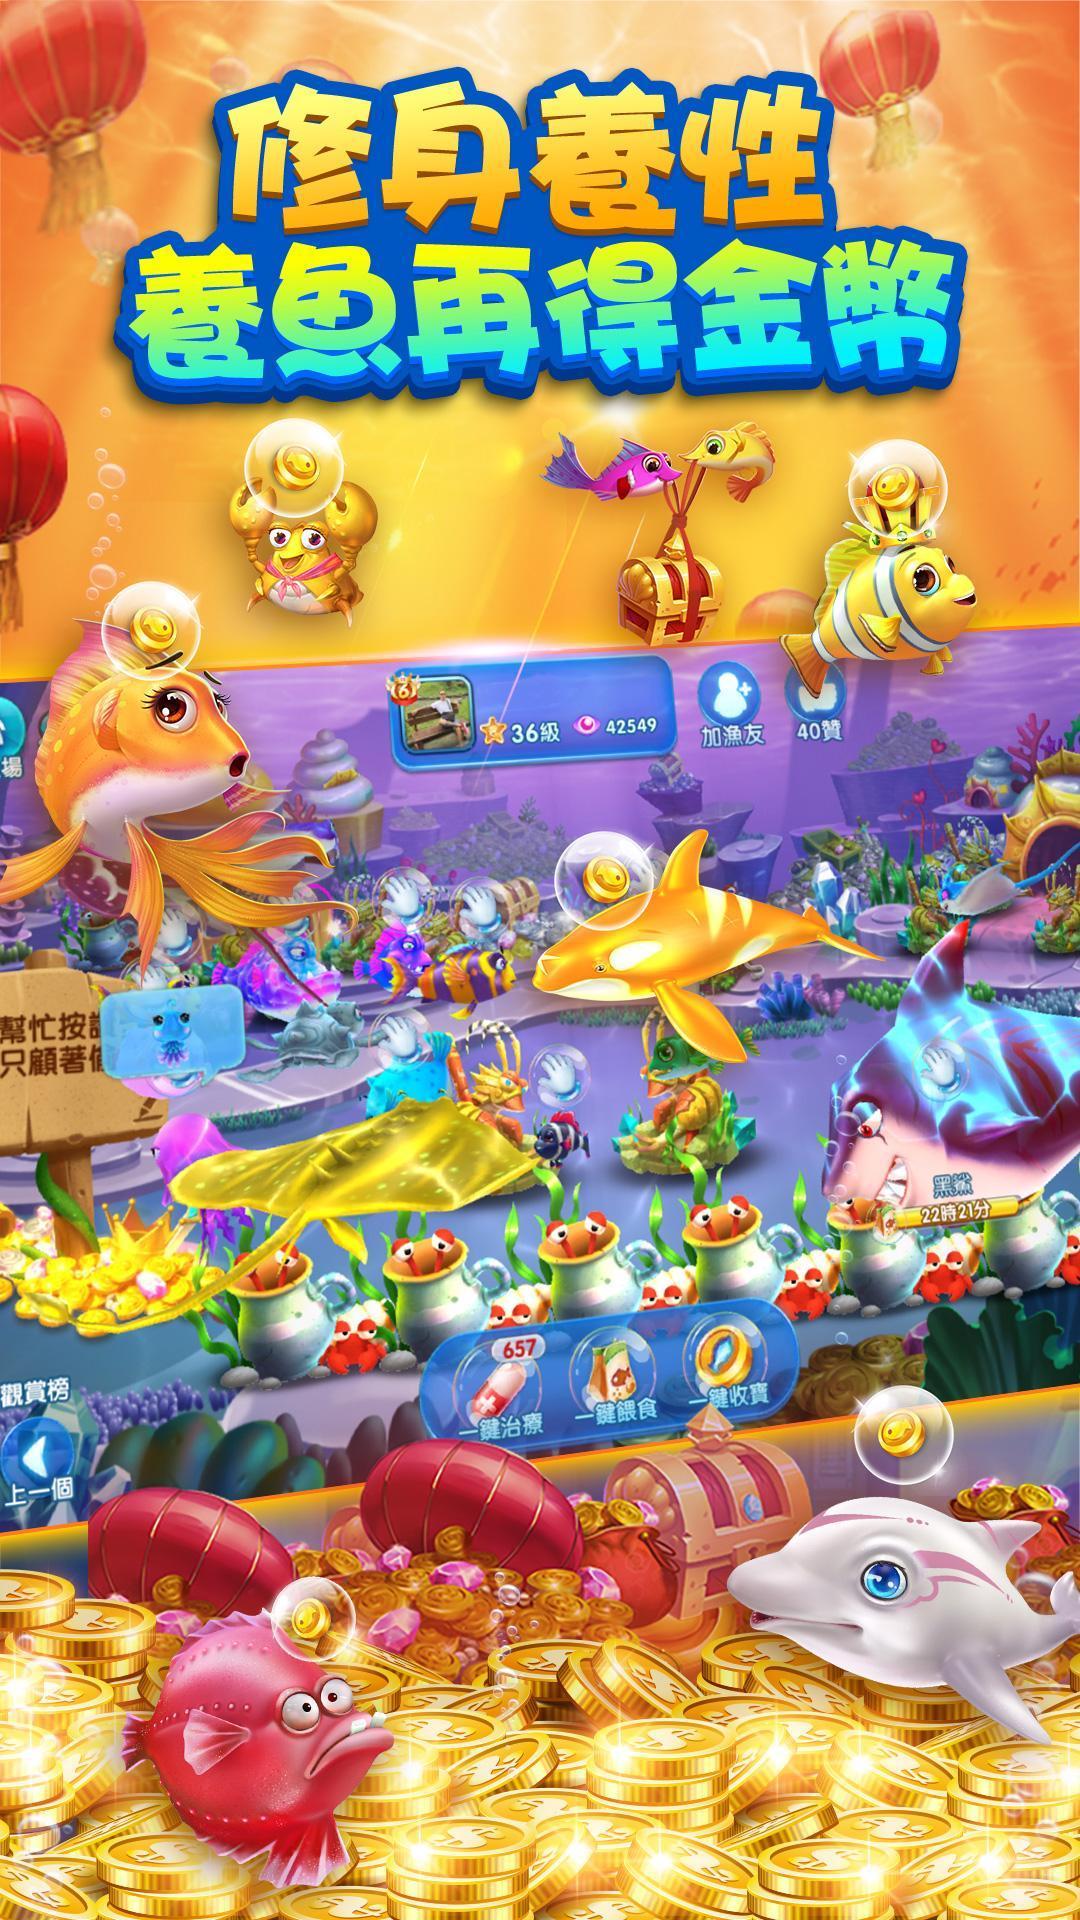 Fish is Coming: Best 3D Arcade 1.16.2 Screenshot 13